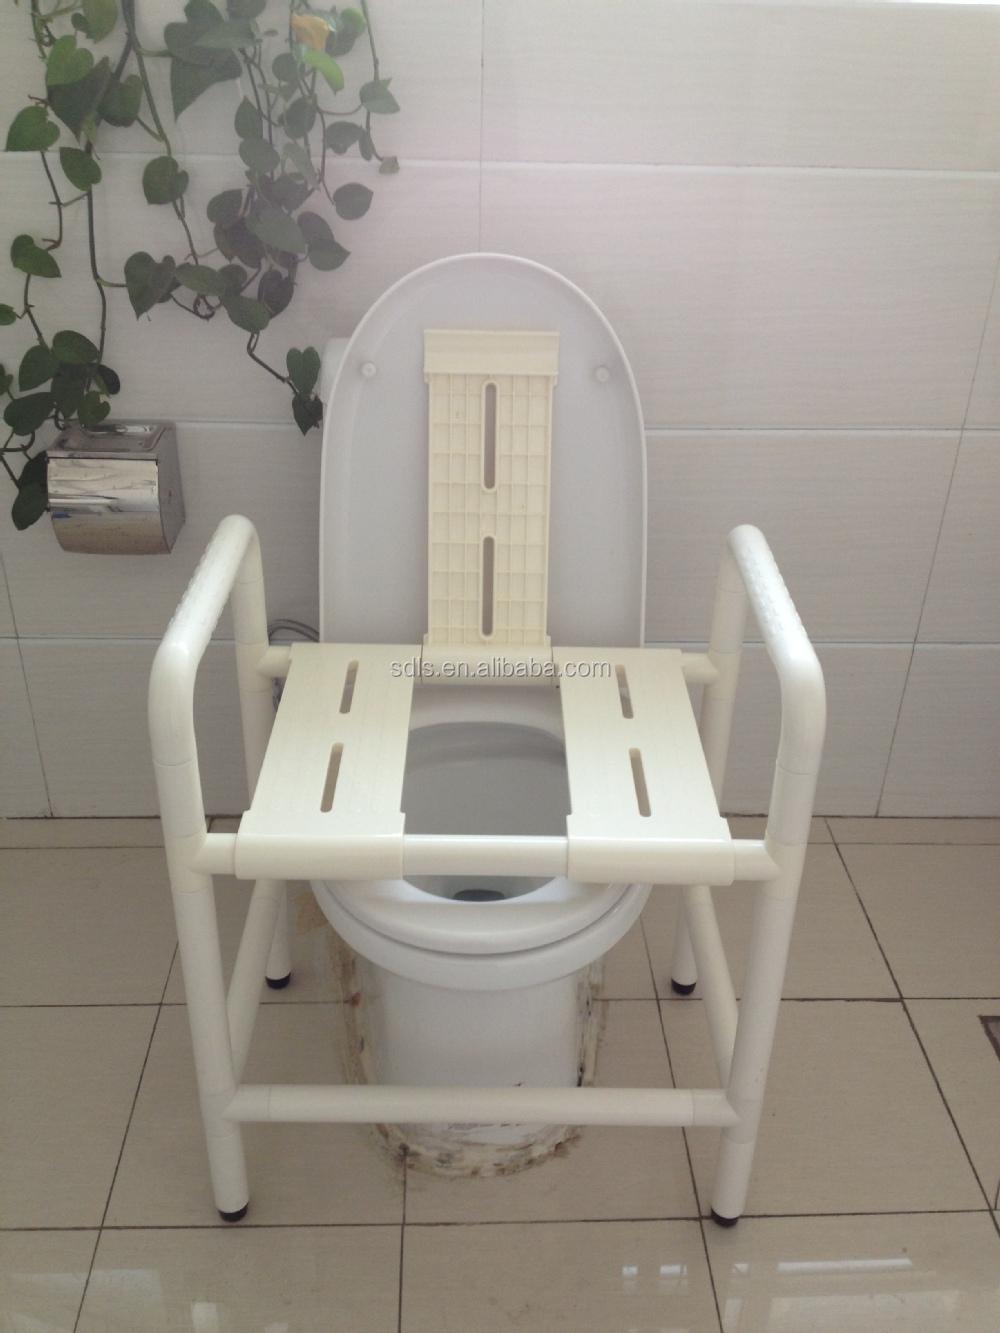 Elderly And Disabled Hip Bath Chair - Buy Hip Bath Chair,Disabled ...